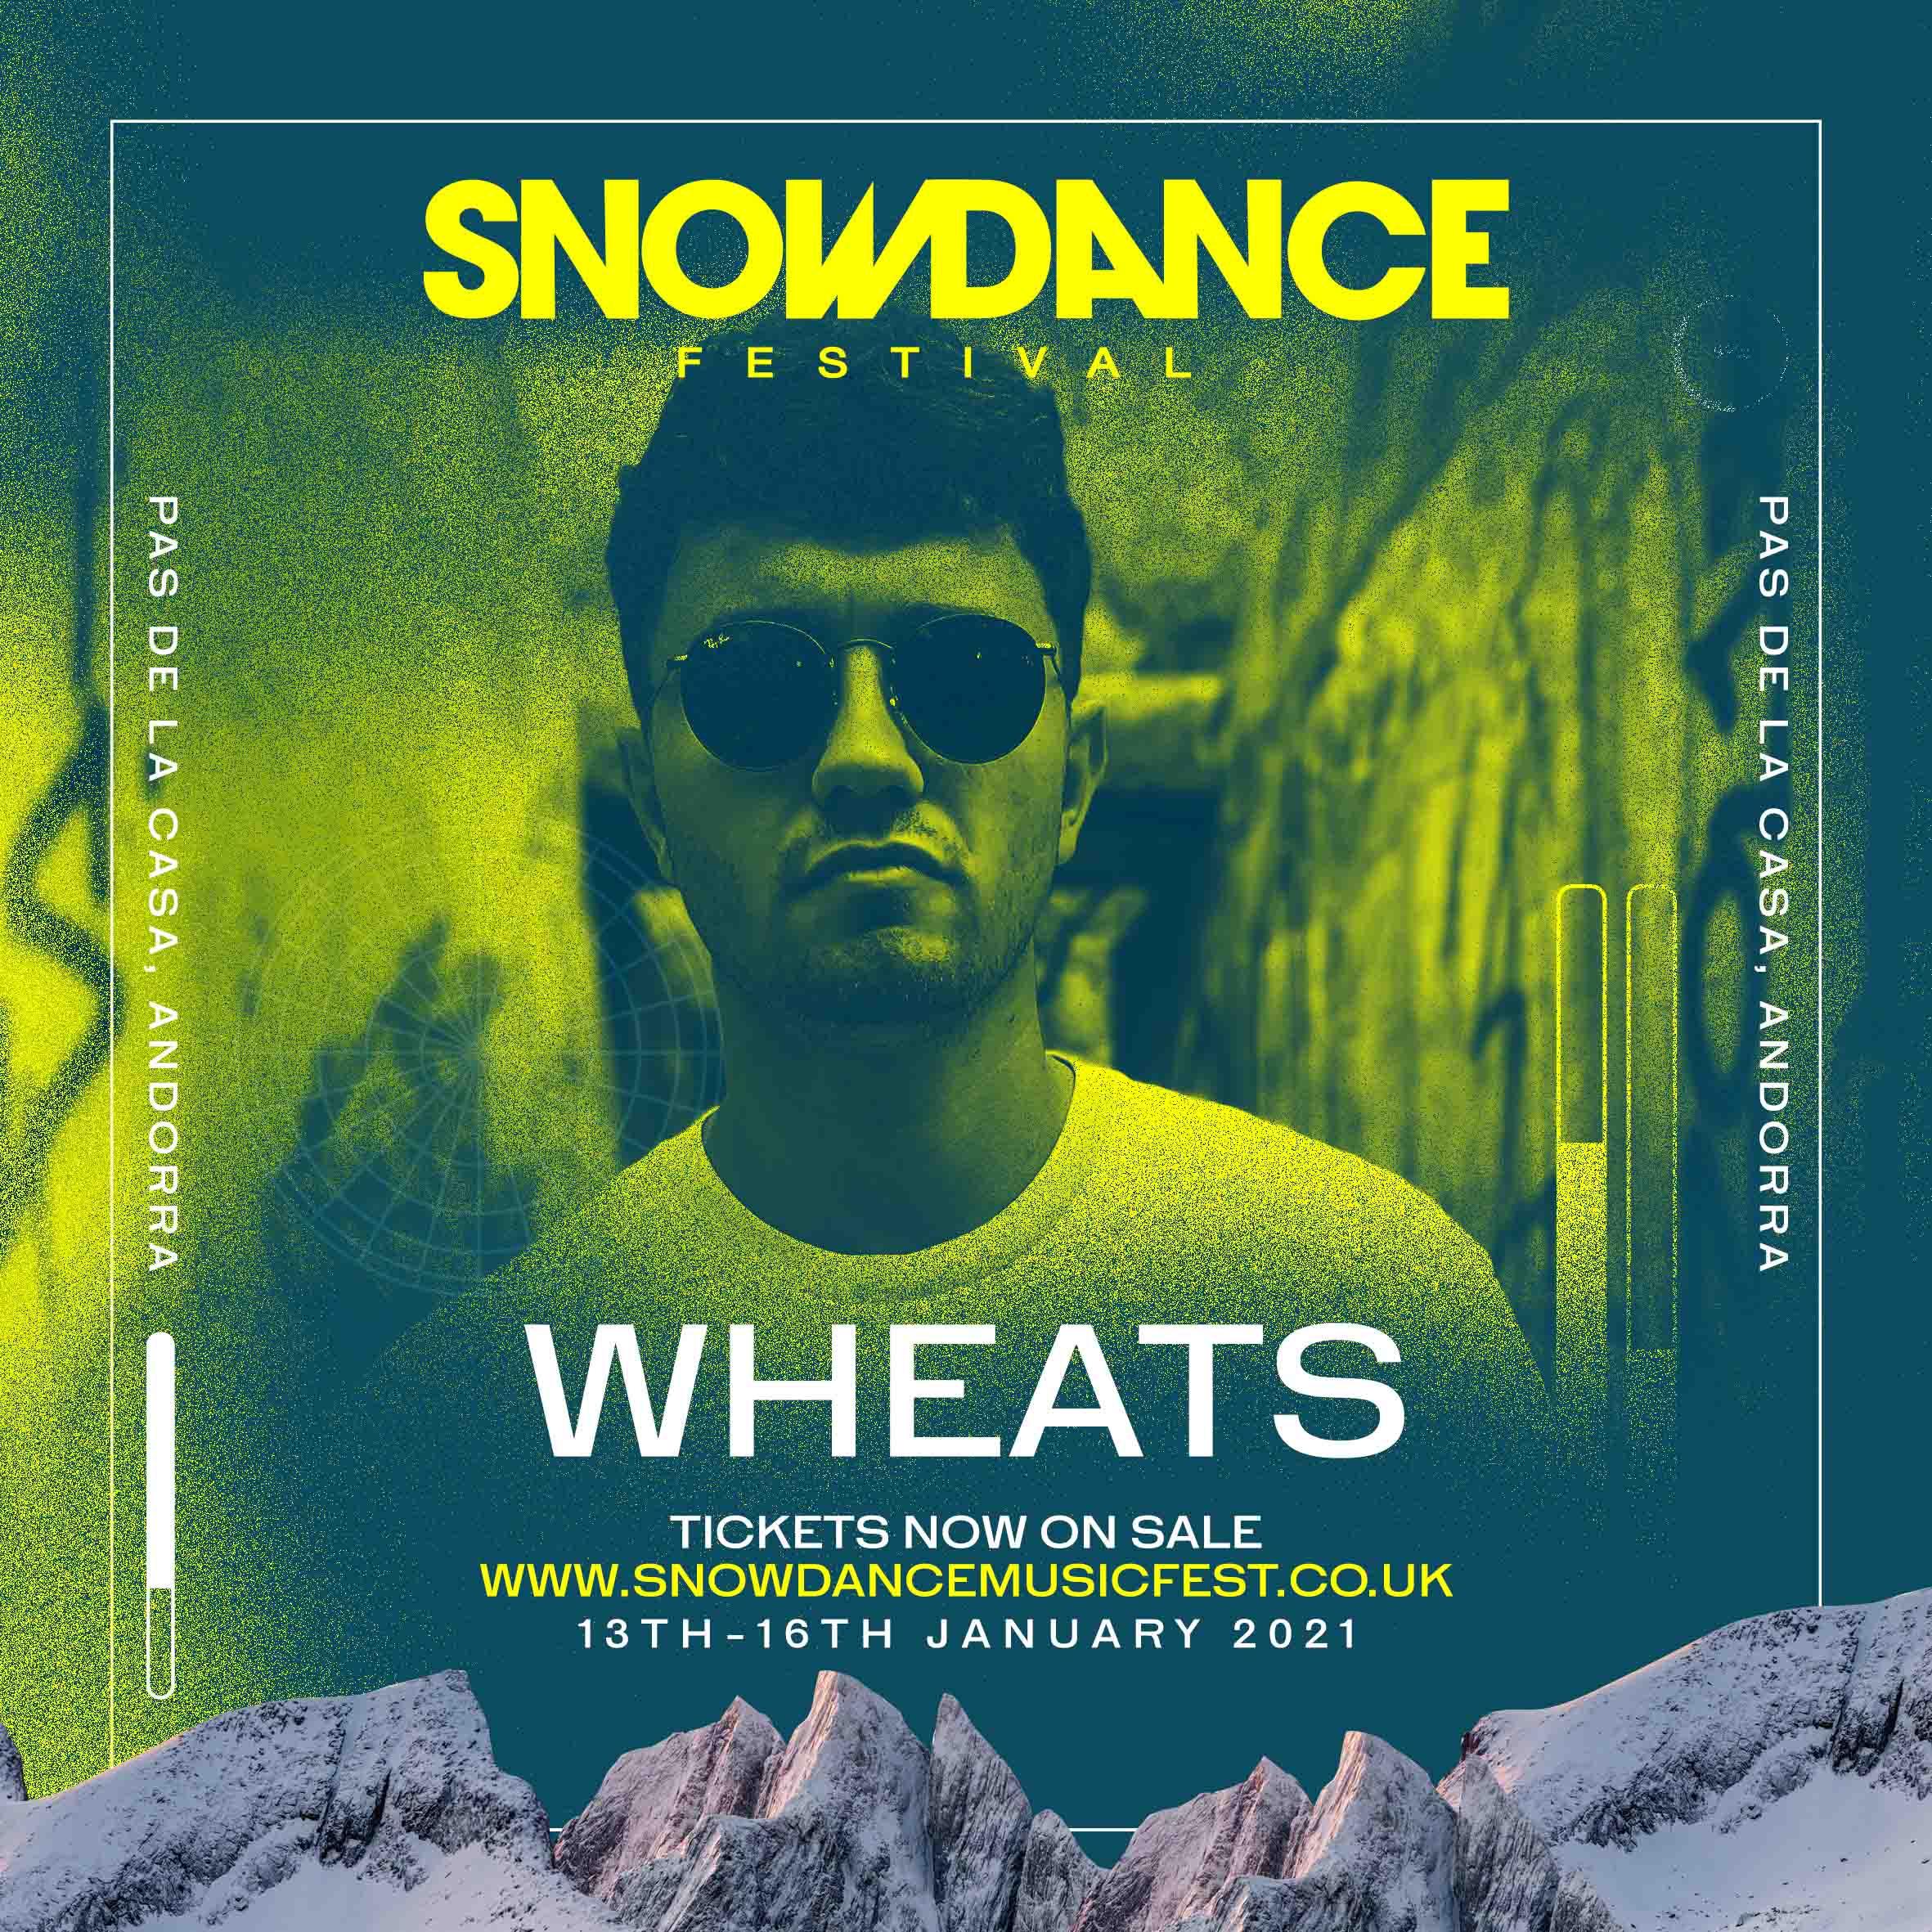 SnowDance festival Wheats